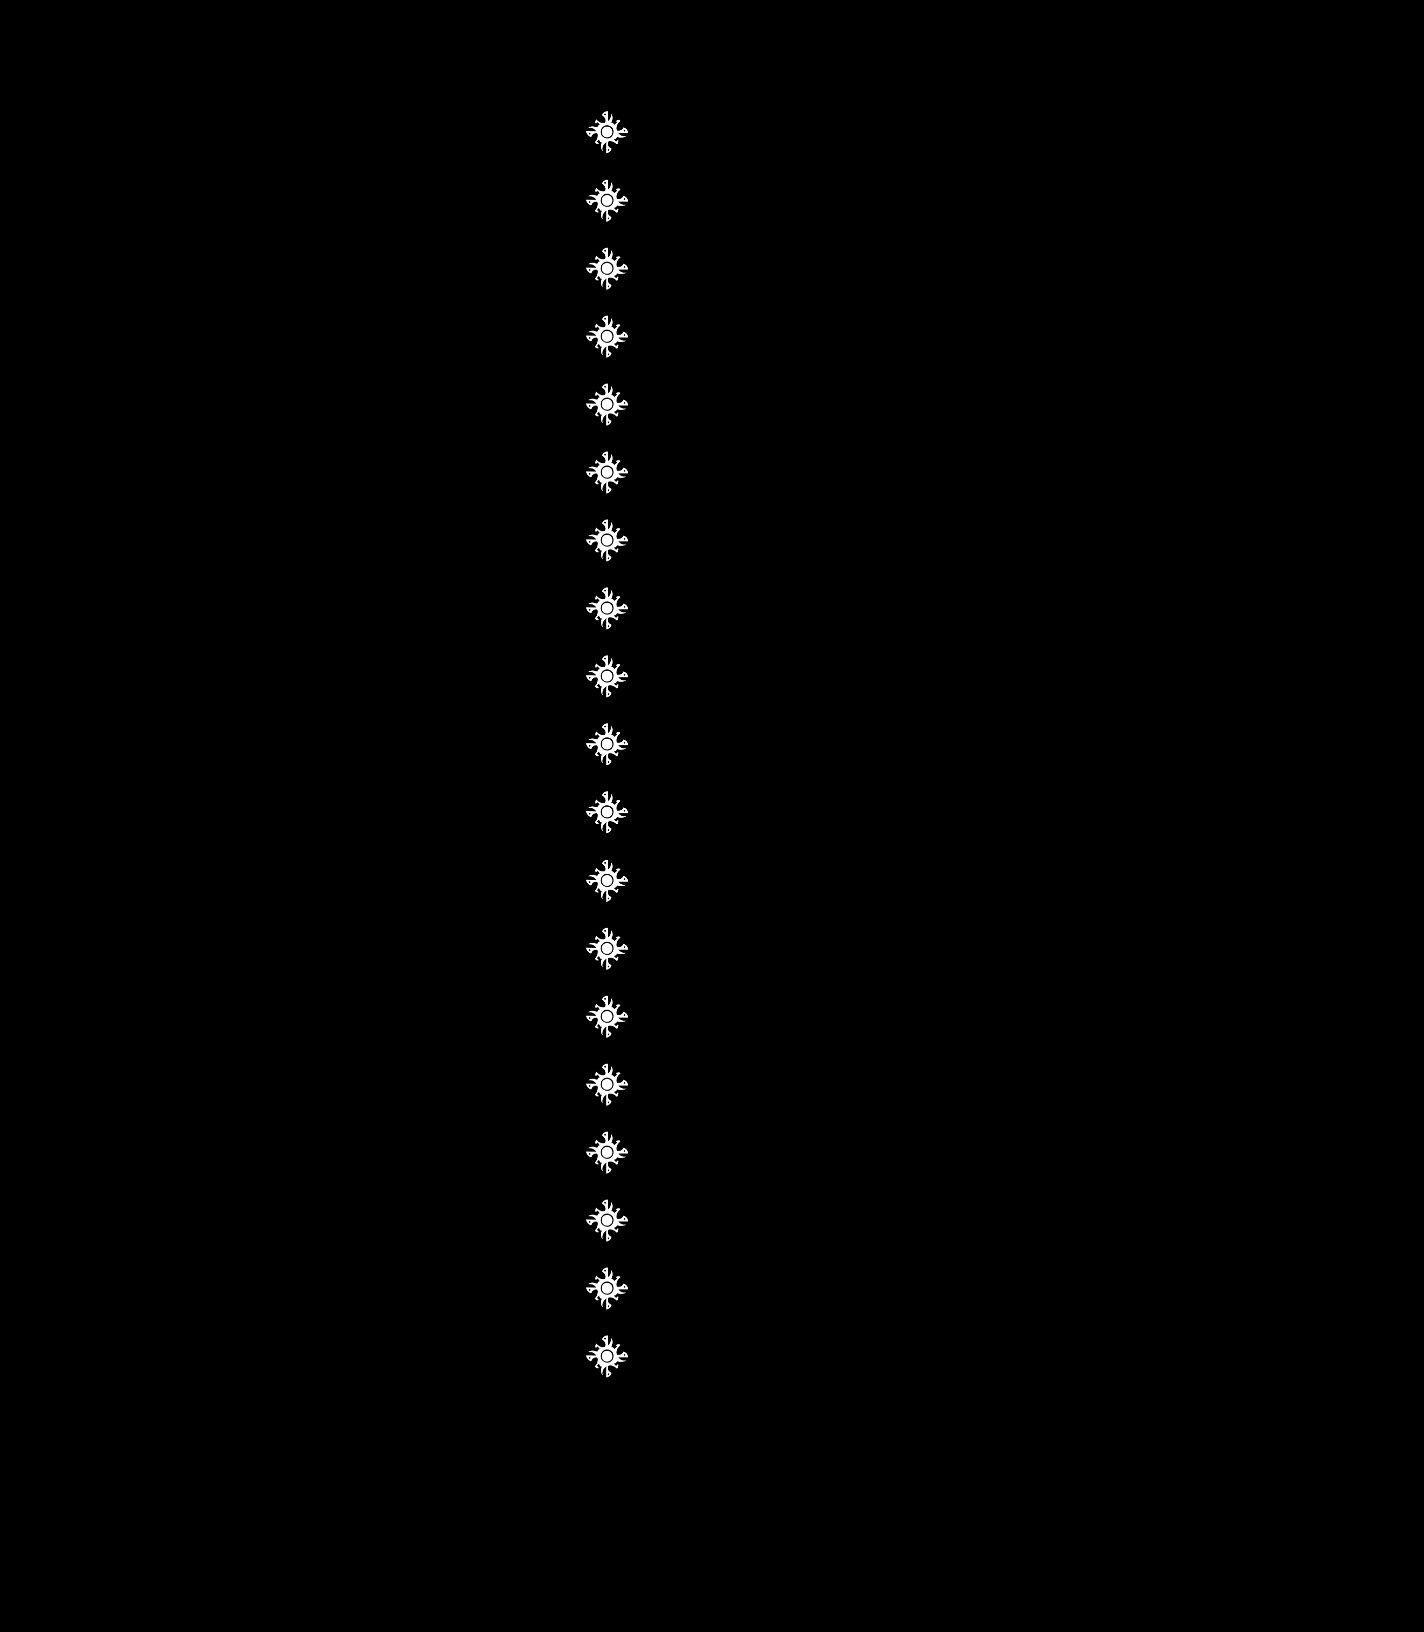 White Line Border Overlays Picsart Overlays Transparent Png Text